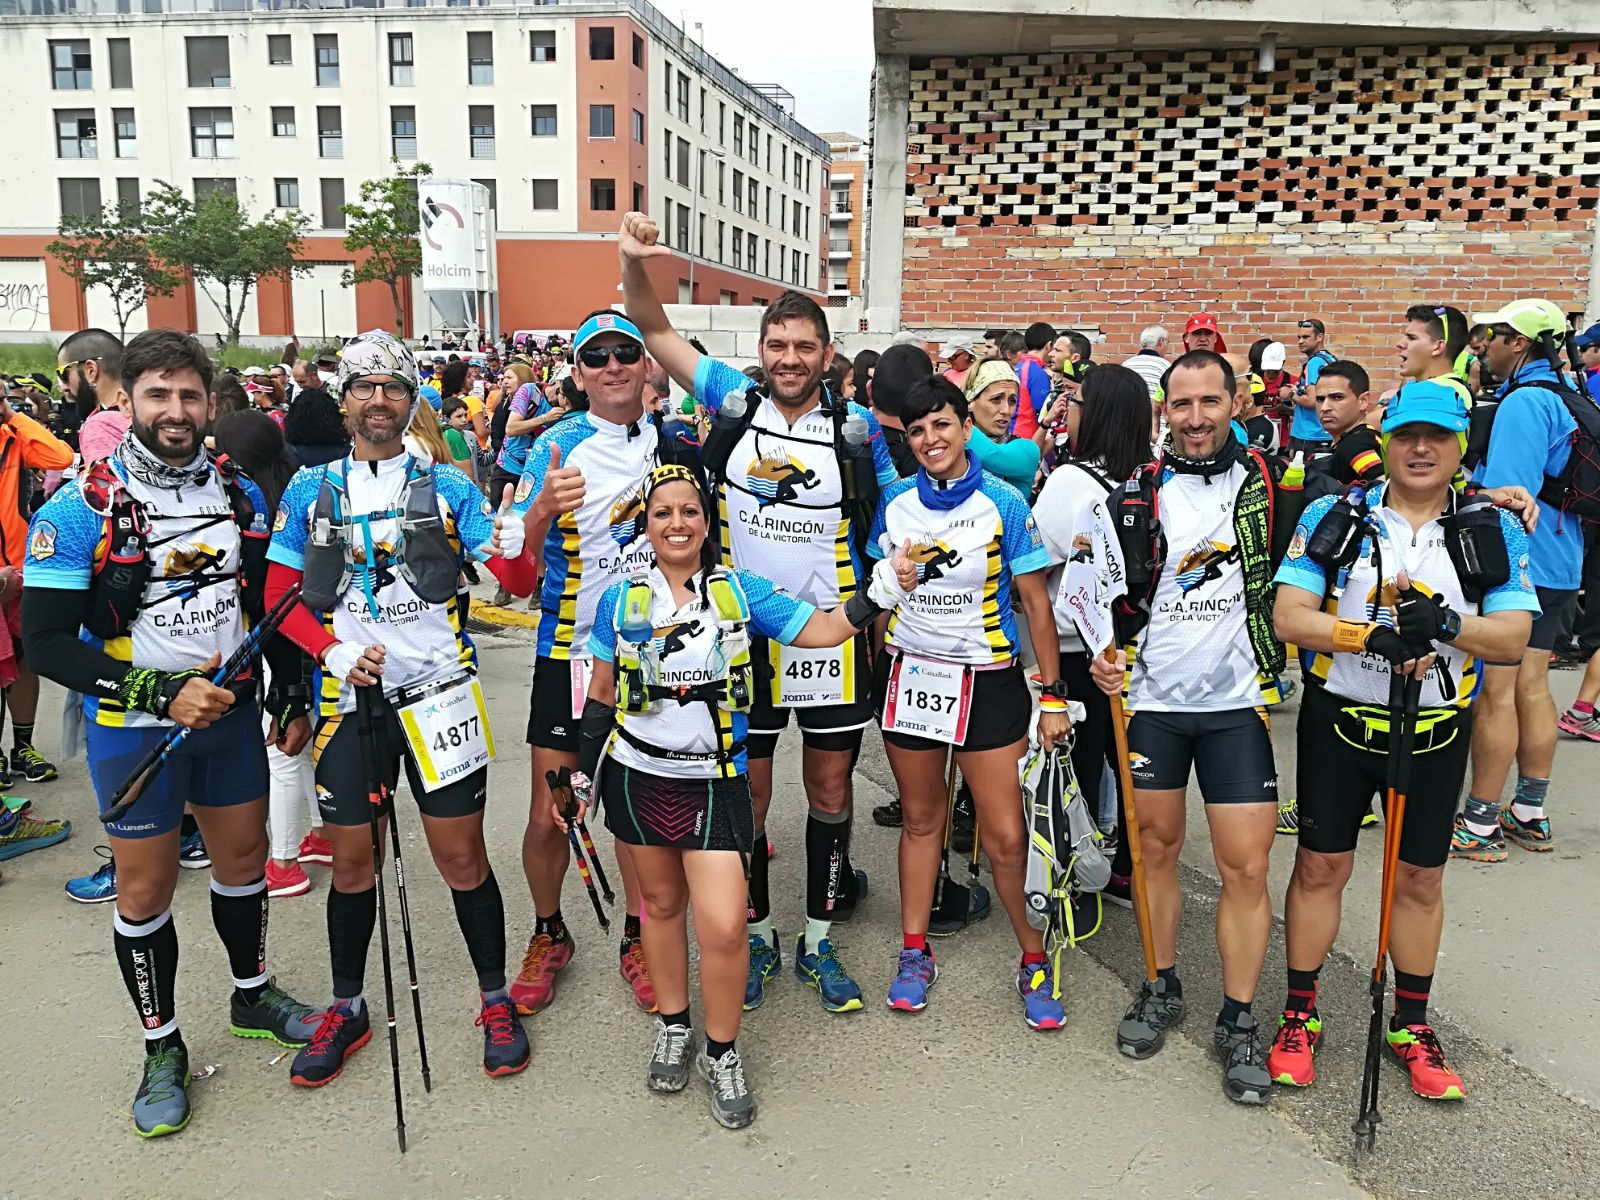 101 KM de RONDA 2018